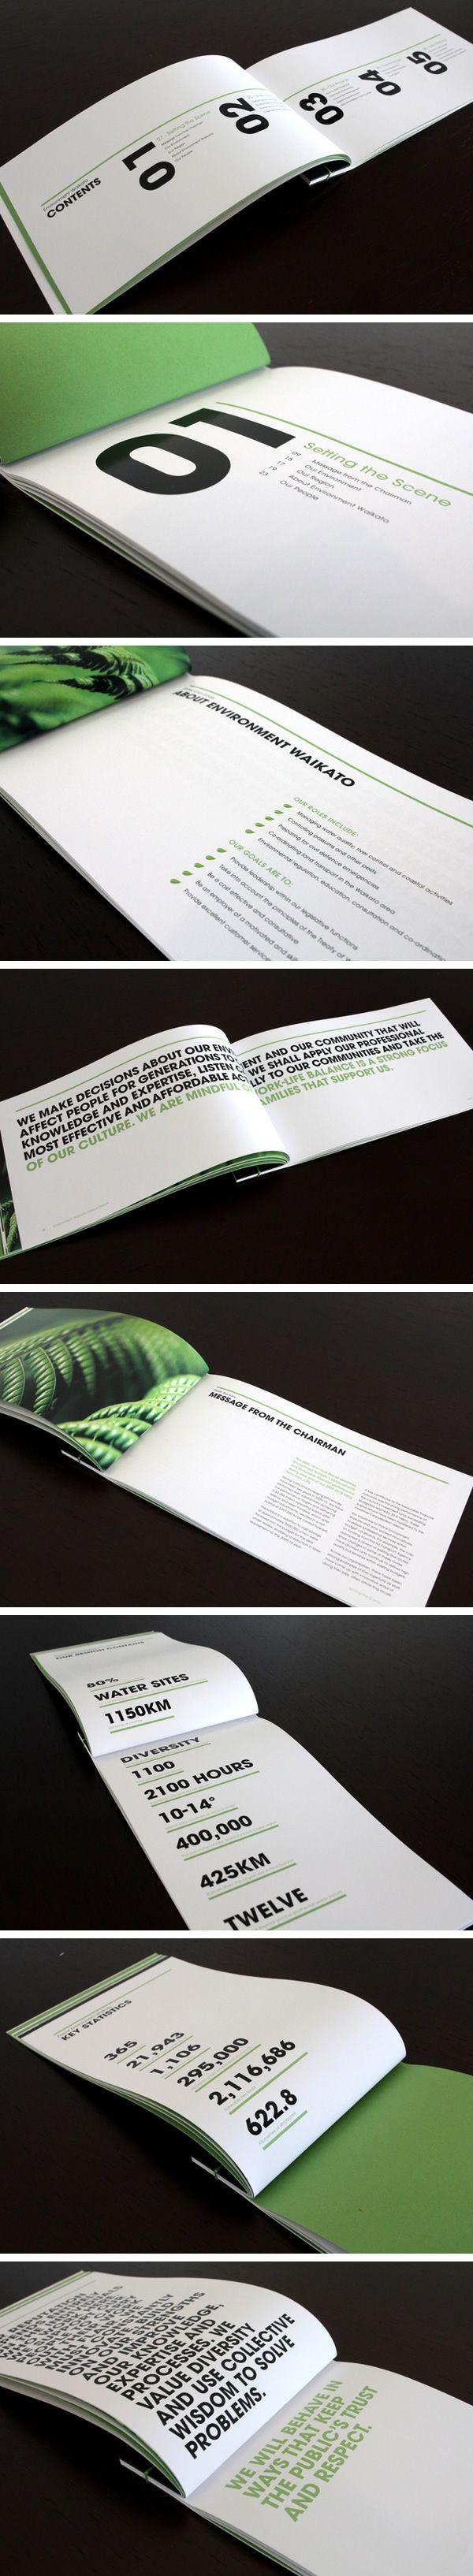 raewyn brandon   environment waikato annual report